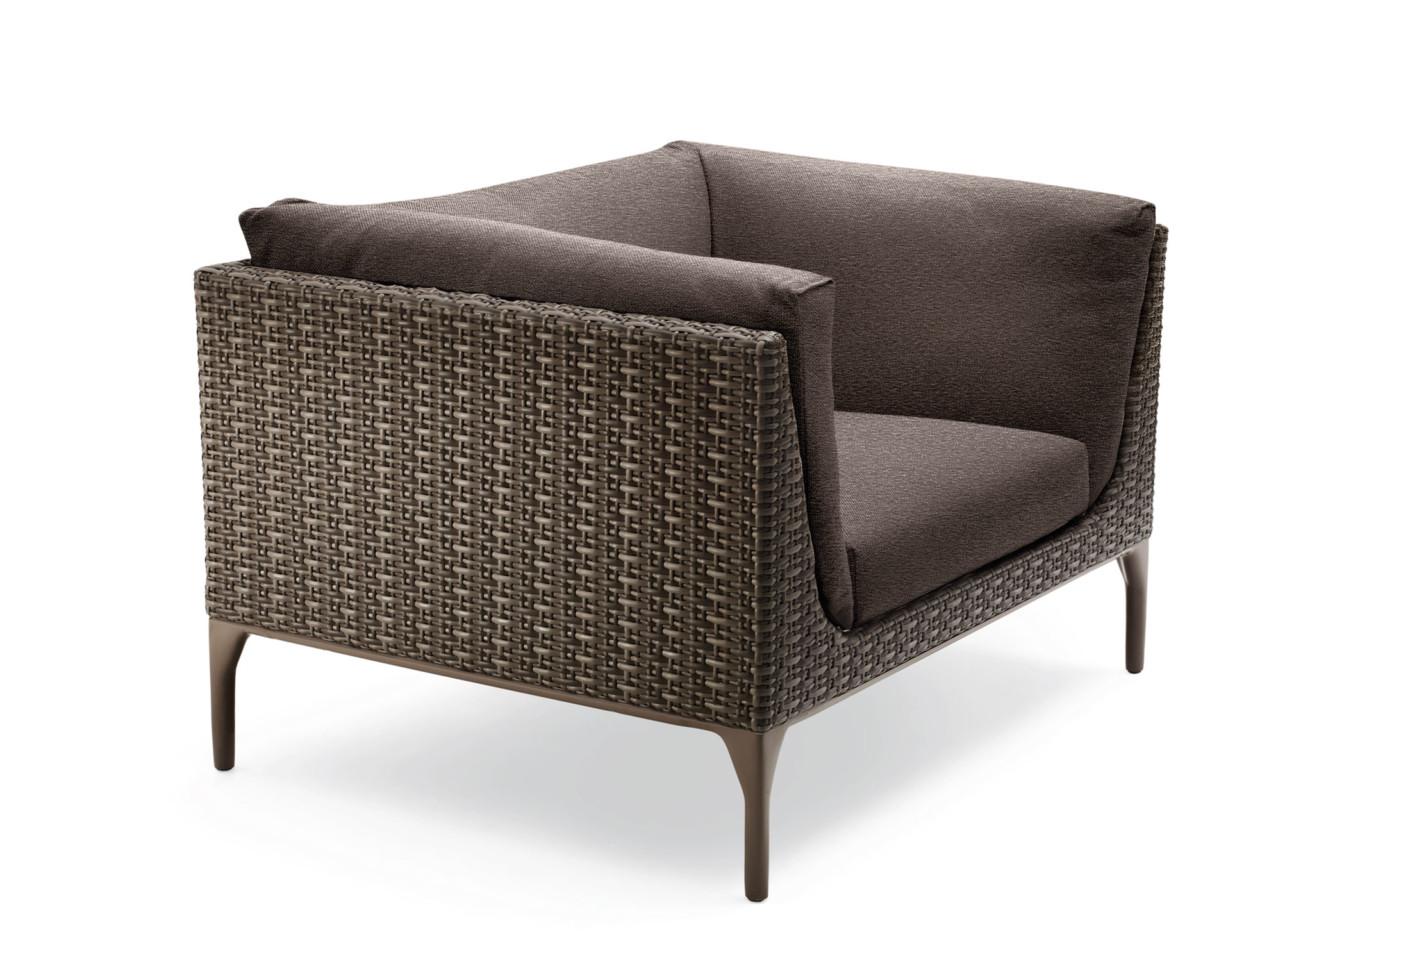 Mu Lounge Chair By Dedon Stylepark